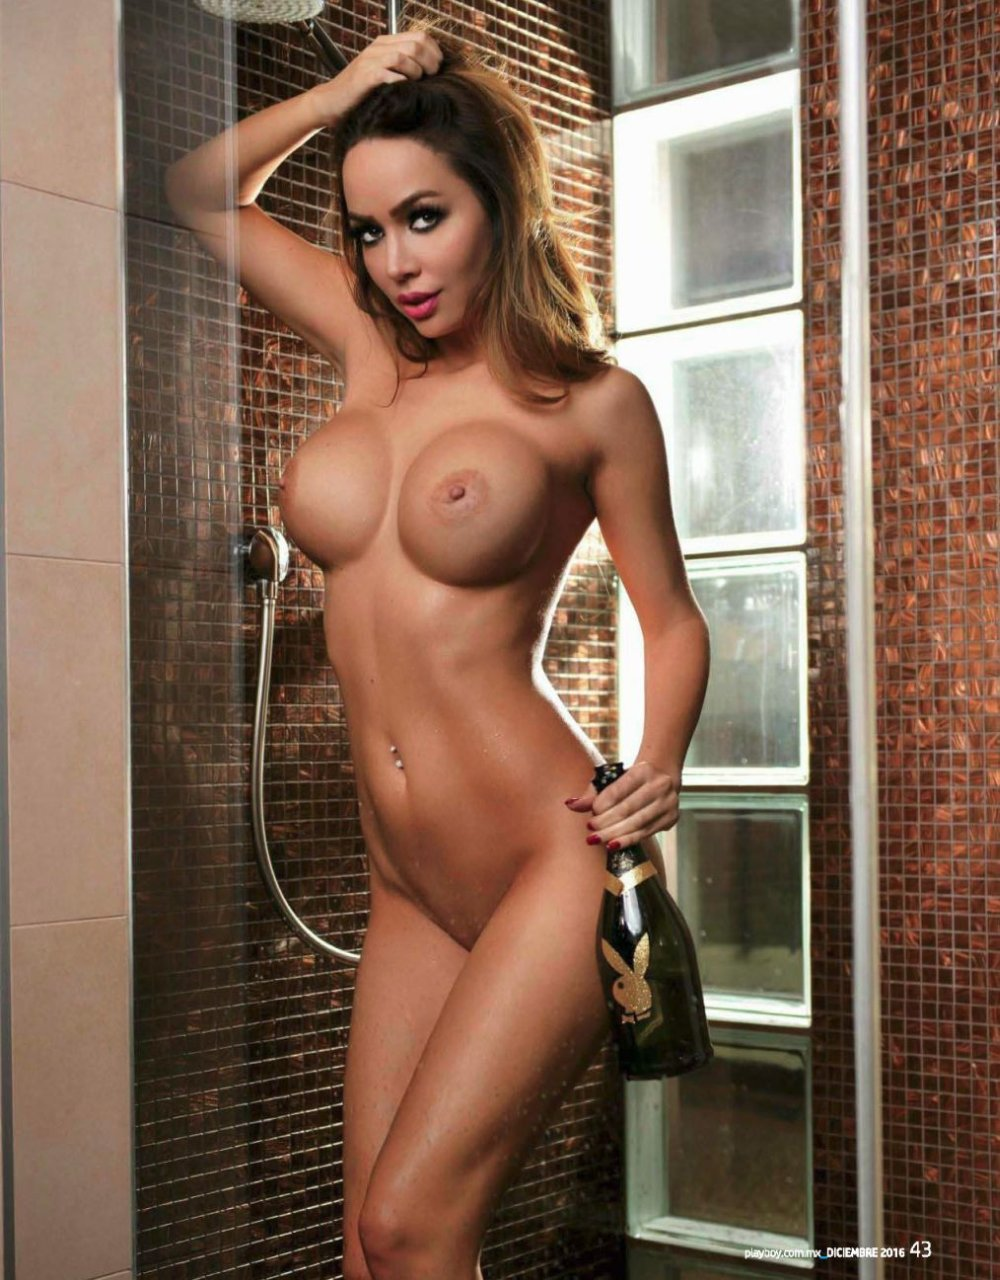 Adrienn levai nude